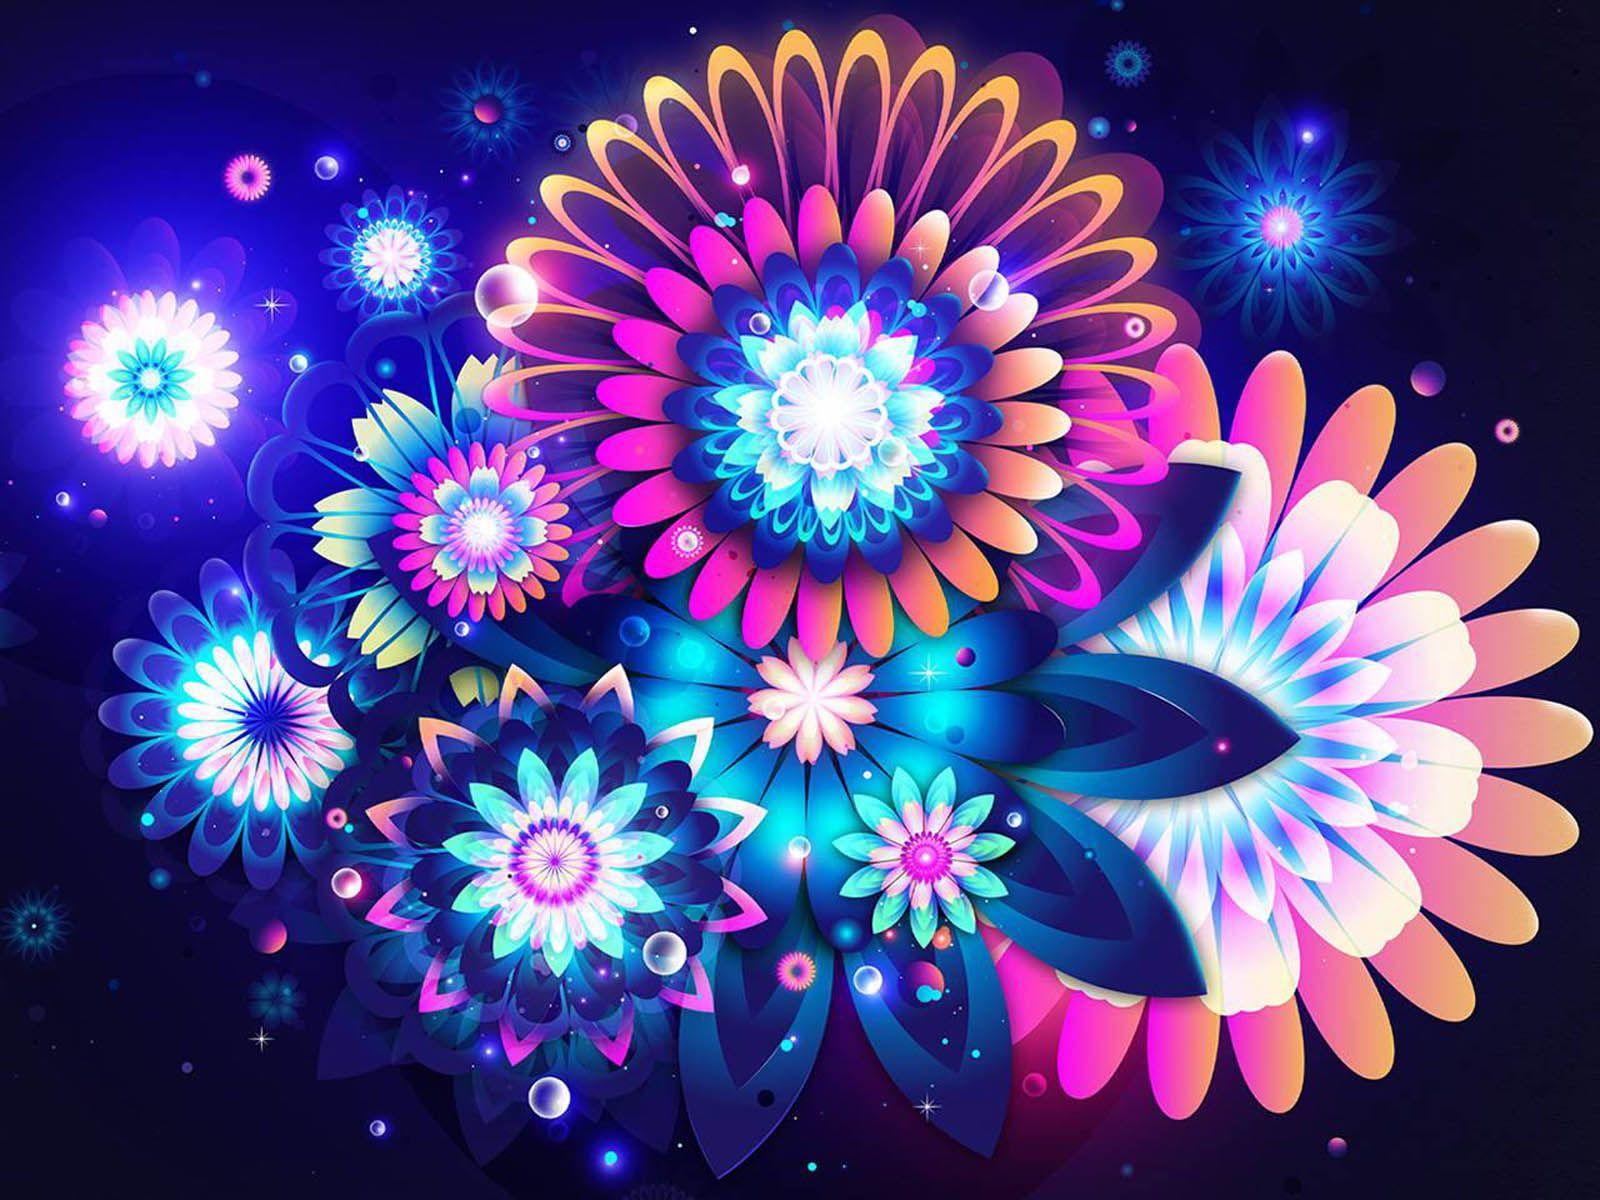 Abstract Computer Backgrounds Flower Wallpaper Abstract Wallpaper Neon Wallpaper